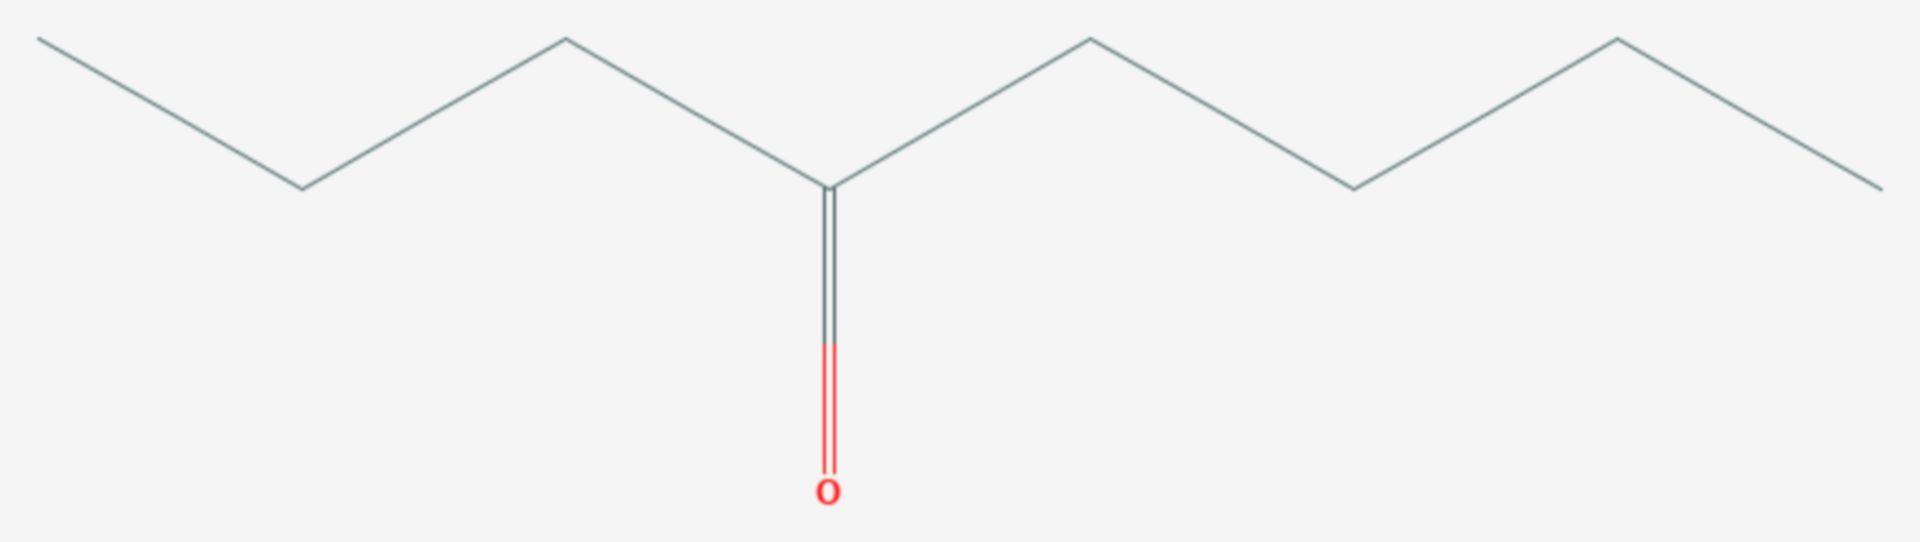 4-Octanon (Strukturformel)